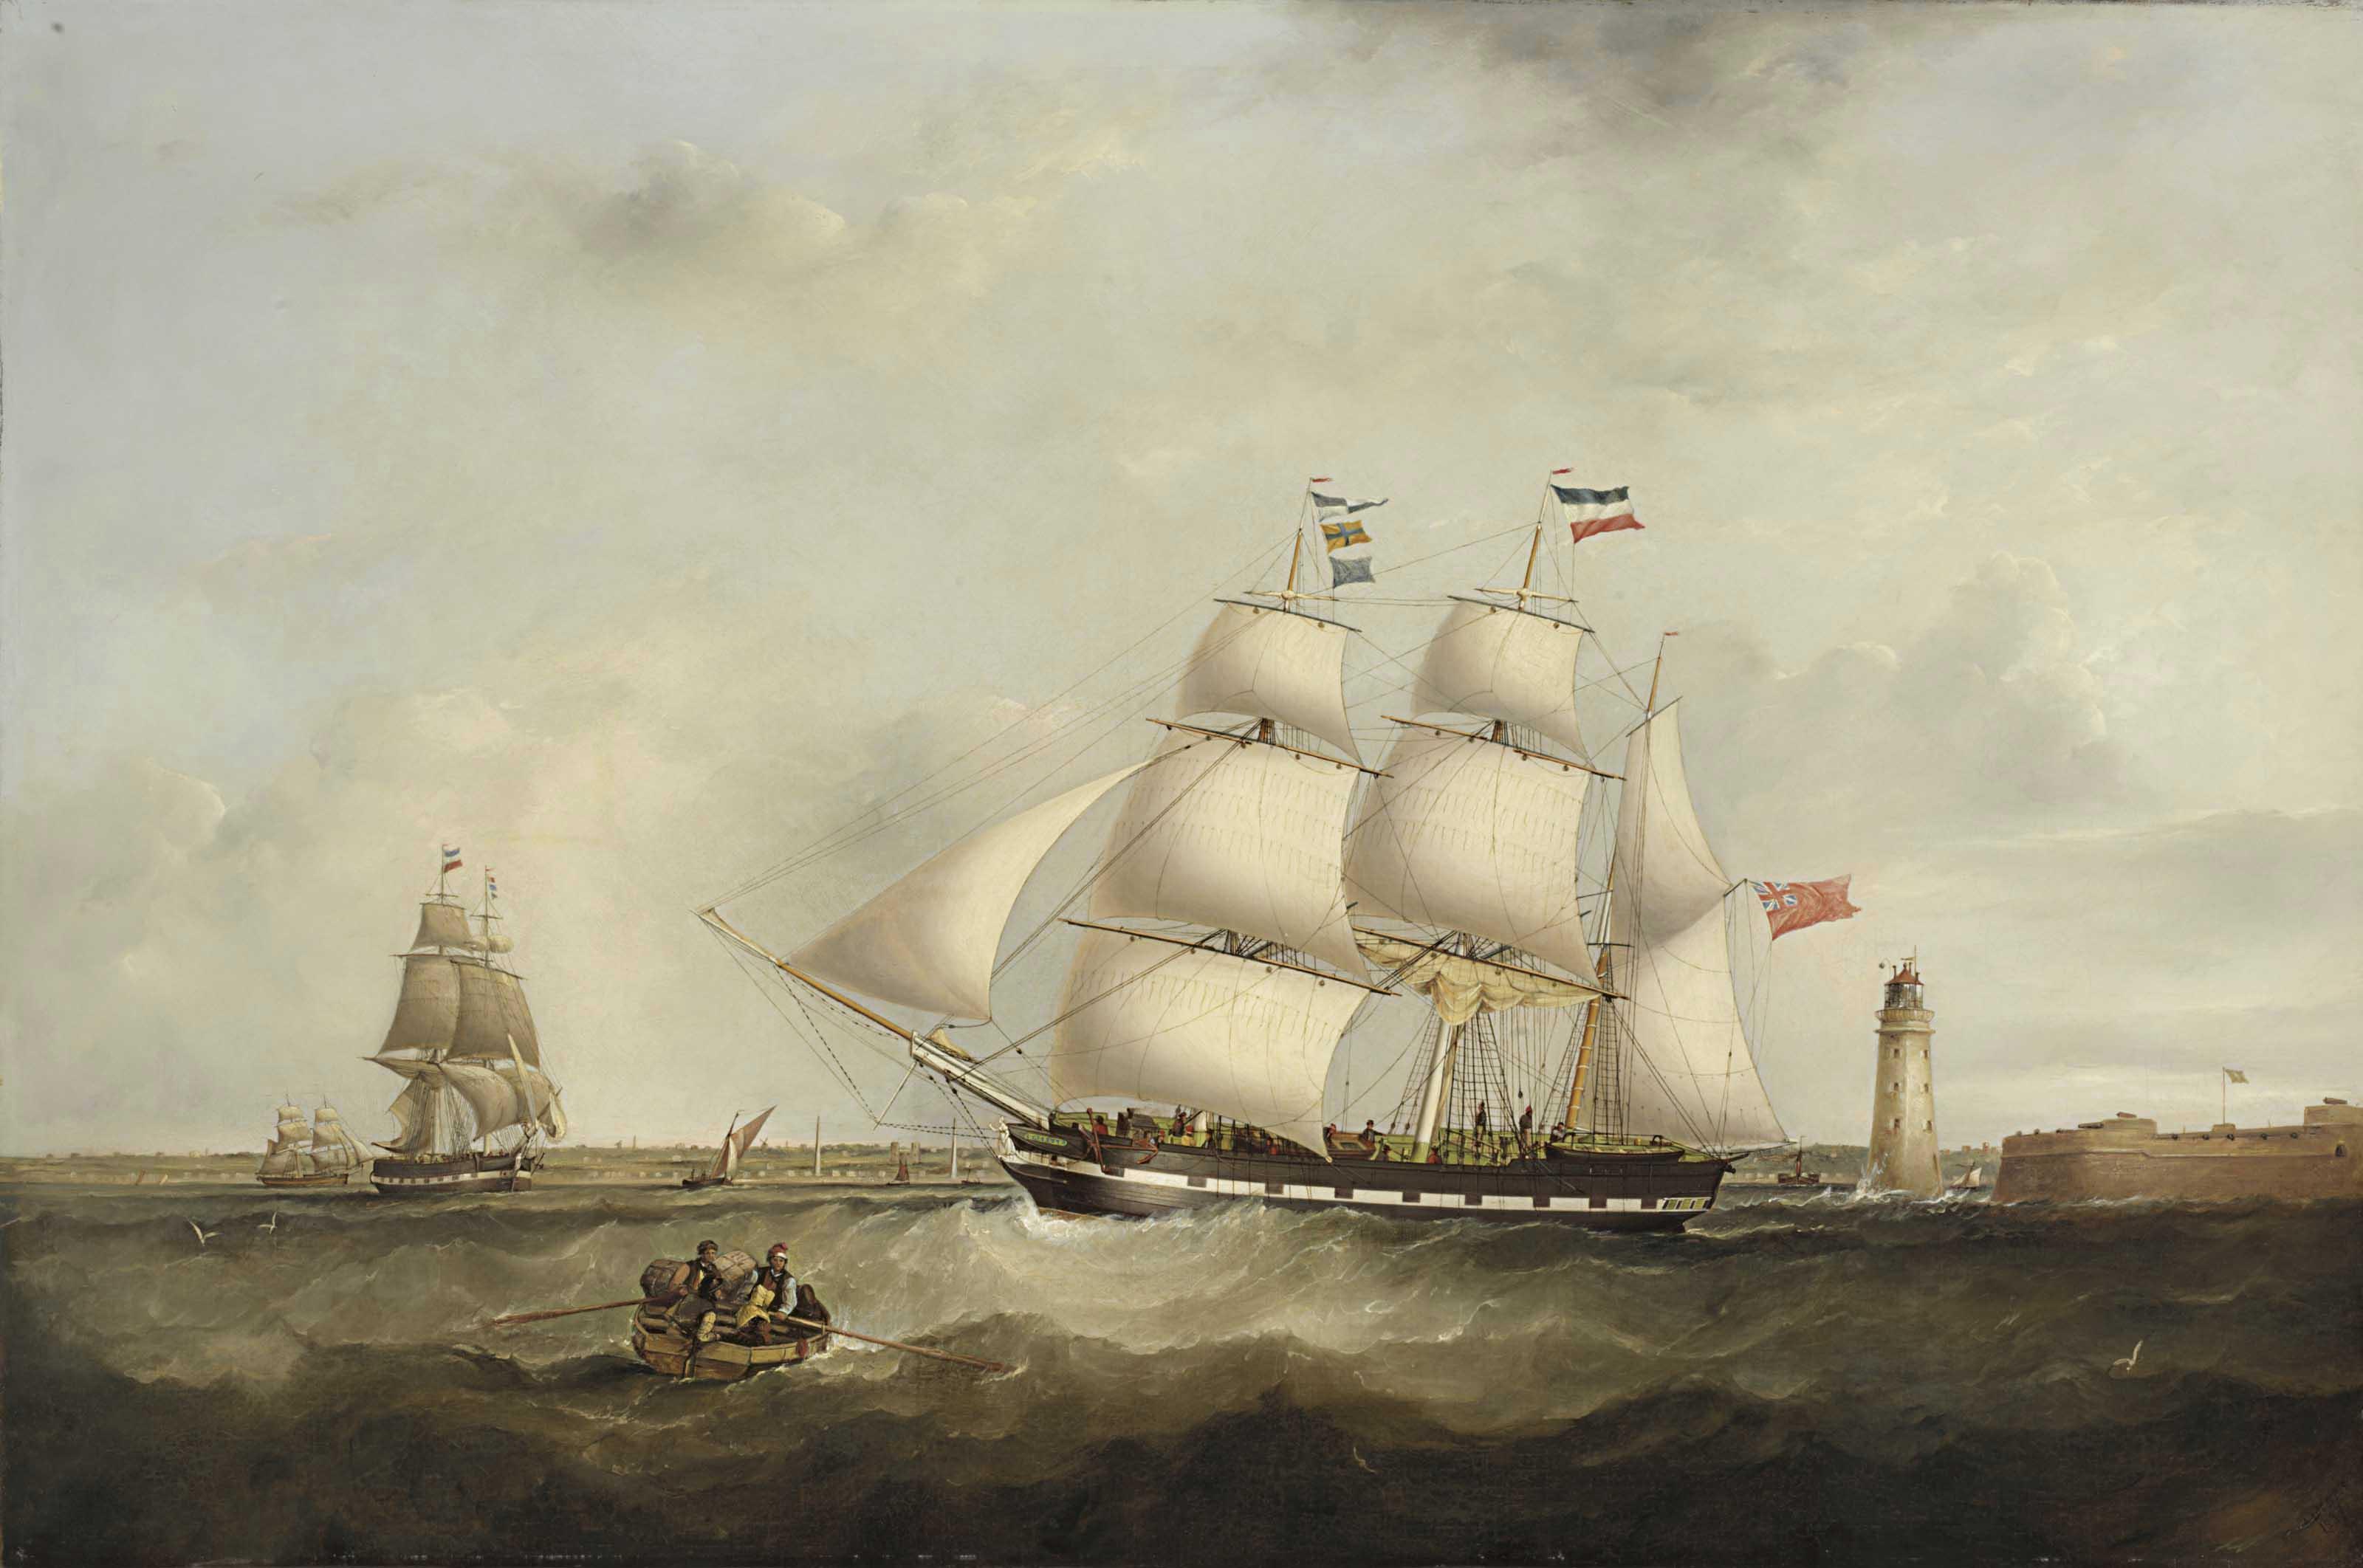 The 'Gazelle' entering the Mersey